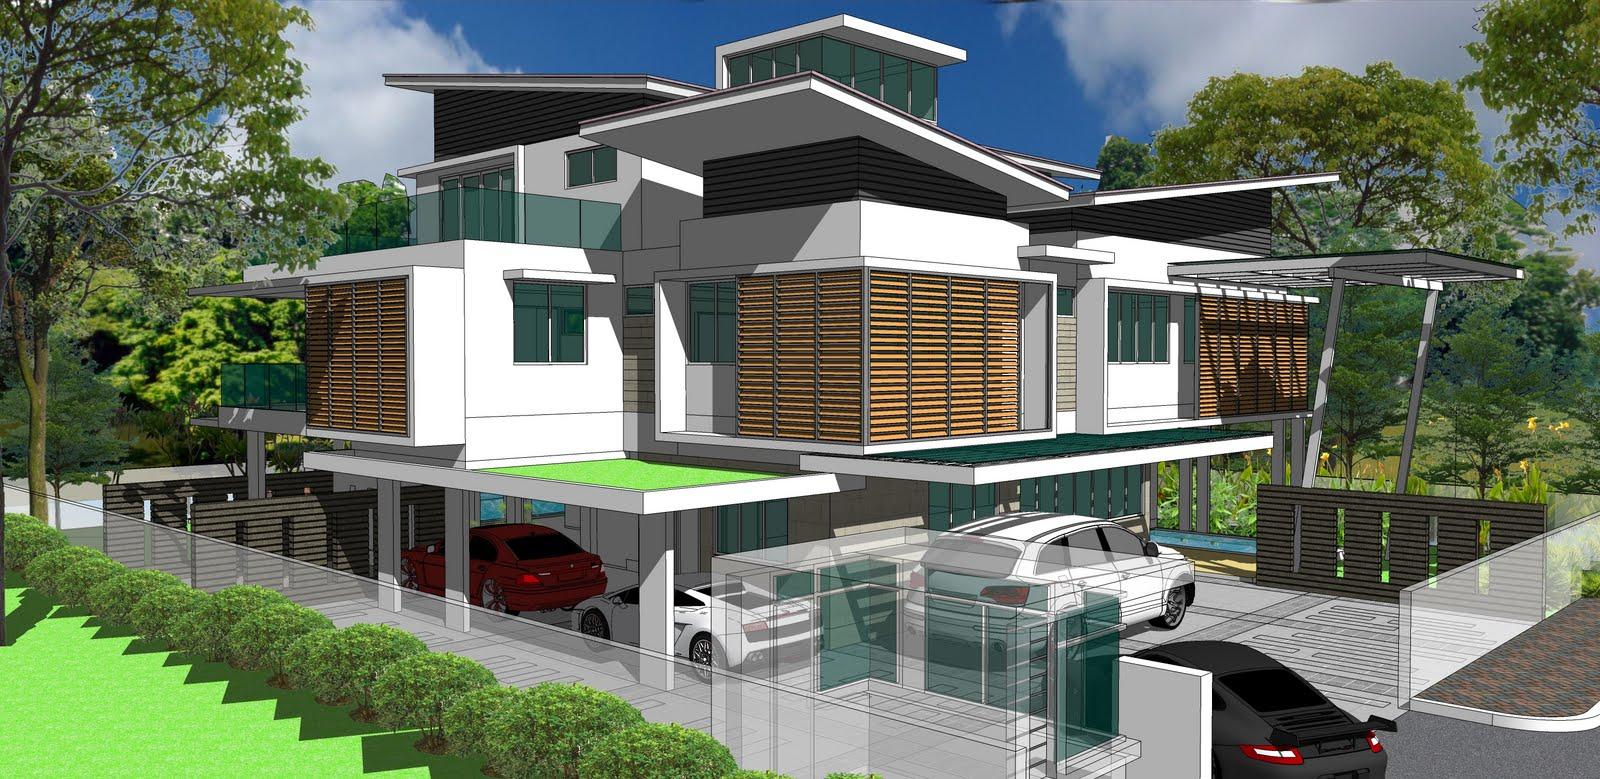 Kenya koto house designs ala design bungalow jln ara bangsar flat roof